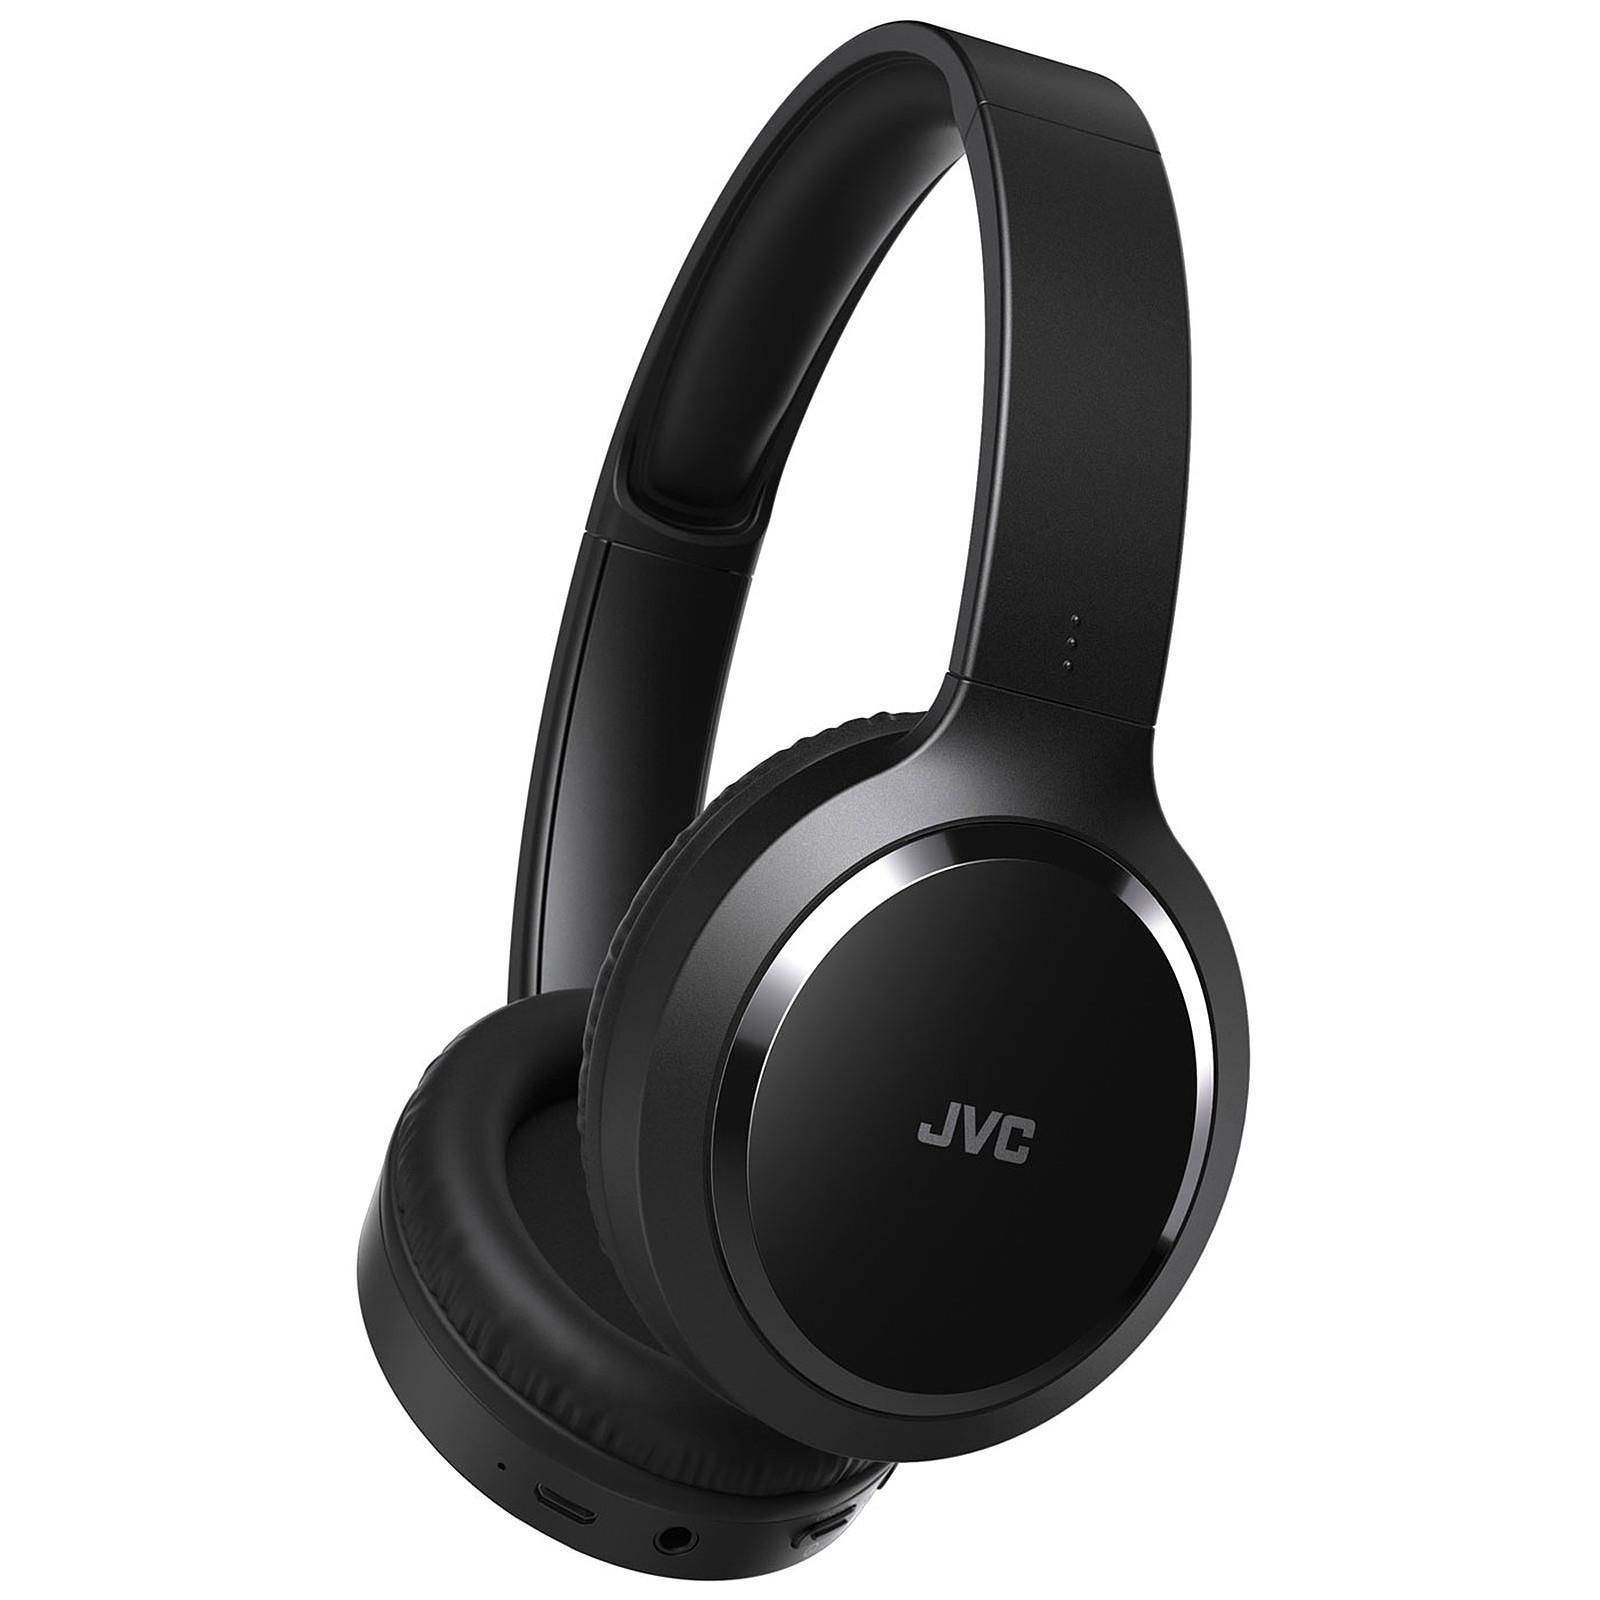 Casque Bluetooth JVC HA-S60BT-B-E, Circum aural, 17h d'autonomie (via ODR 10€)